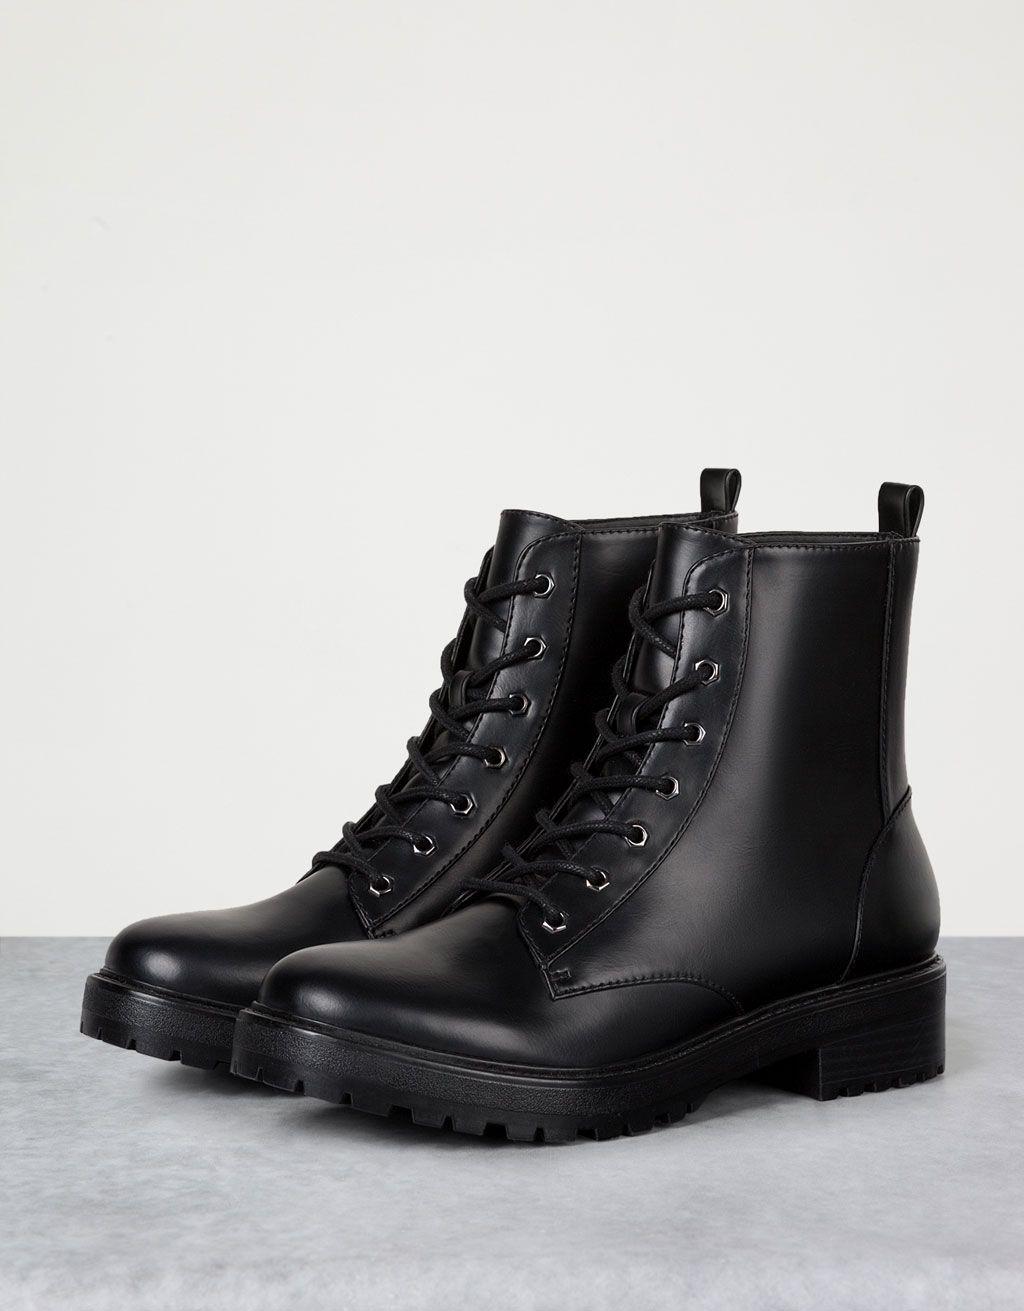 66e5dd50 Basic flat, lace-up ankle boots - View All - Bershka United Arab Emirates